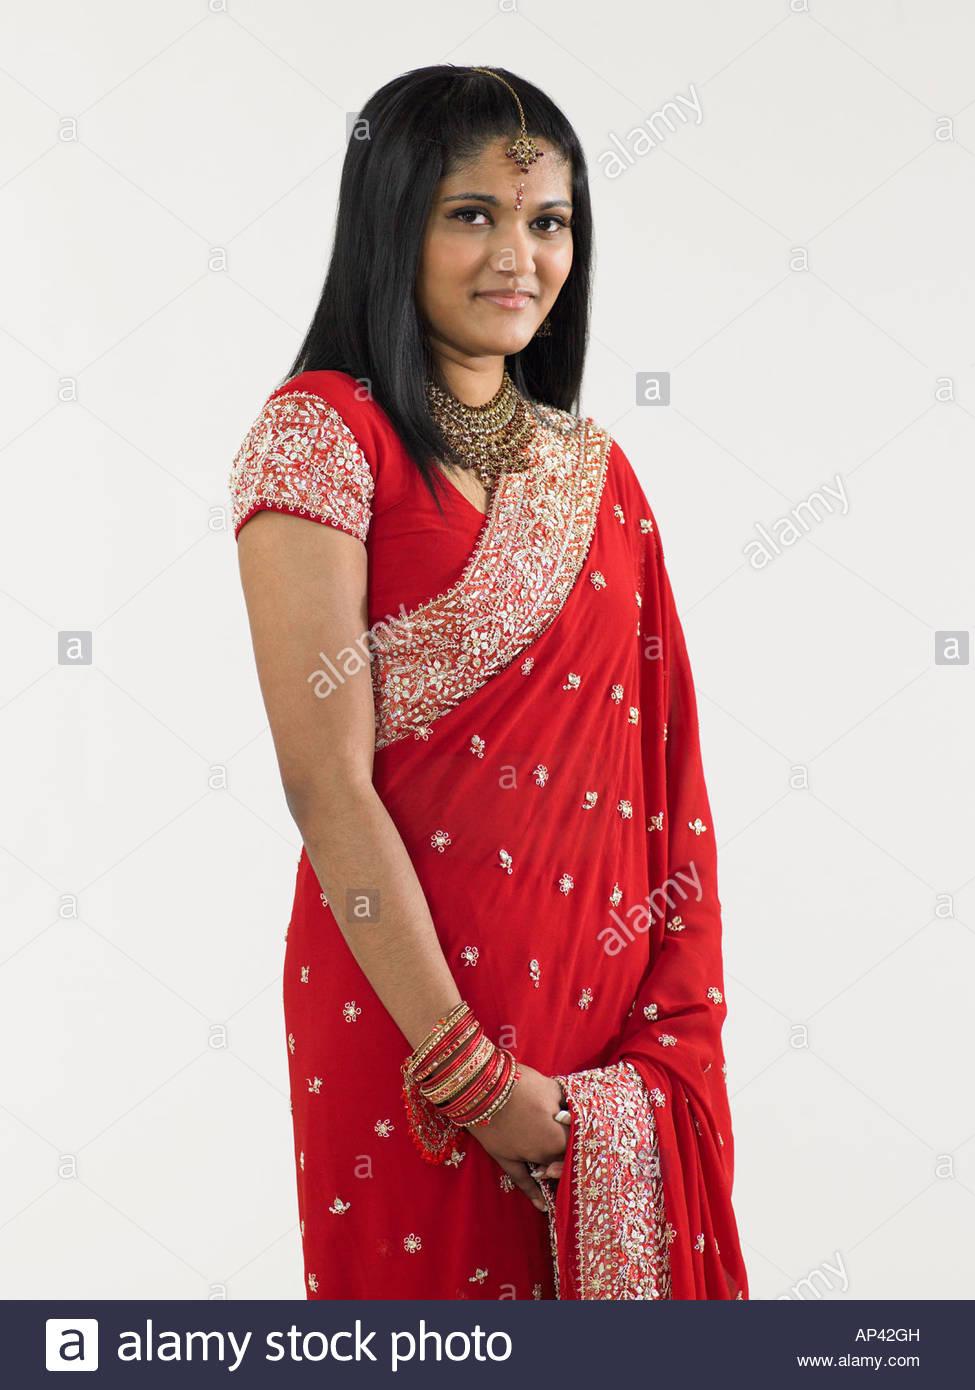 Young woman wearing a sari - Stock Image